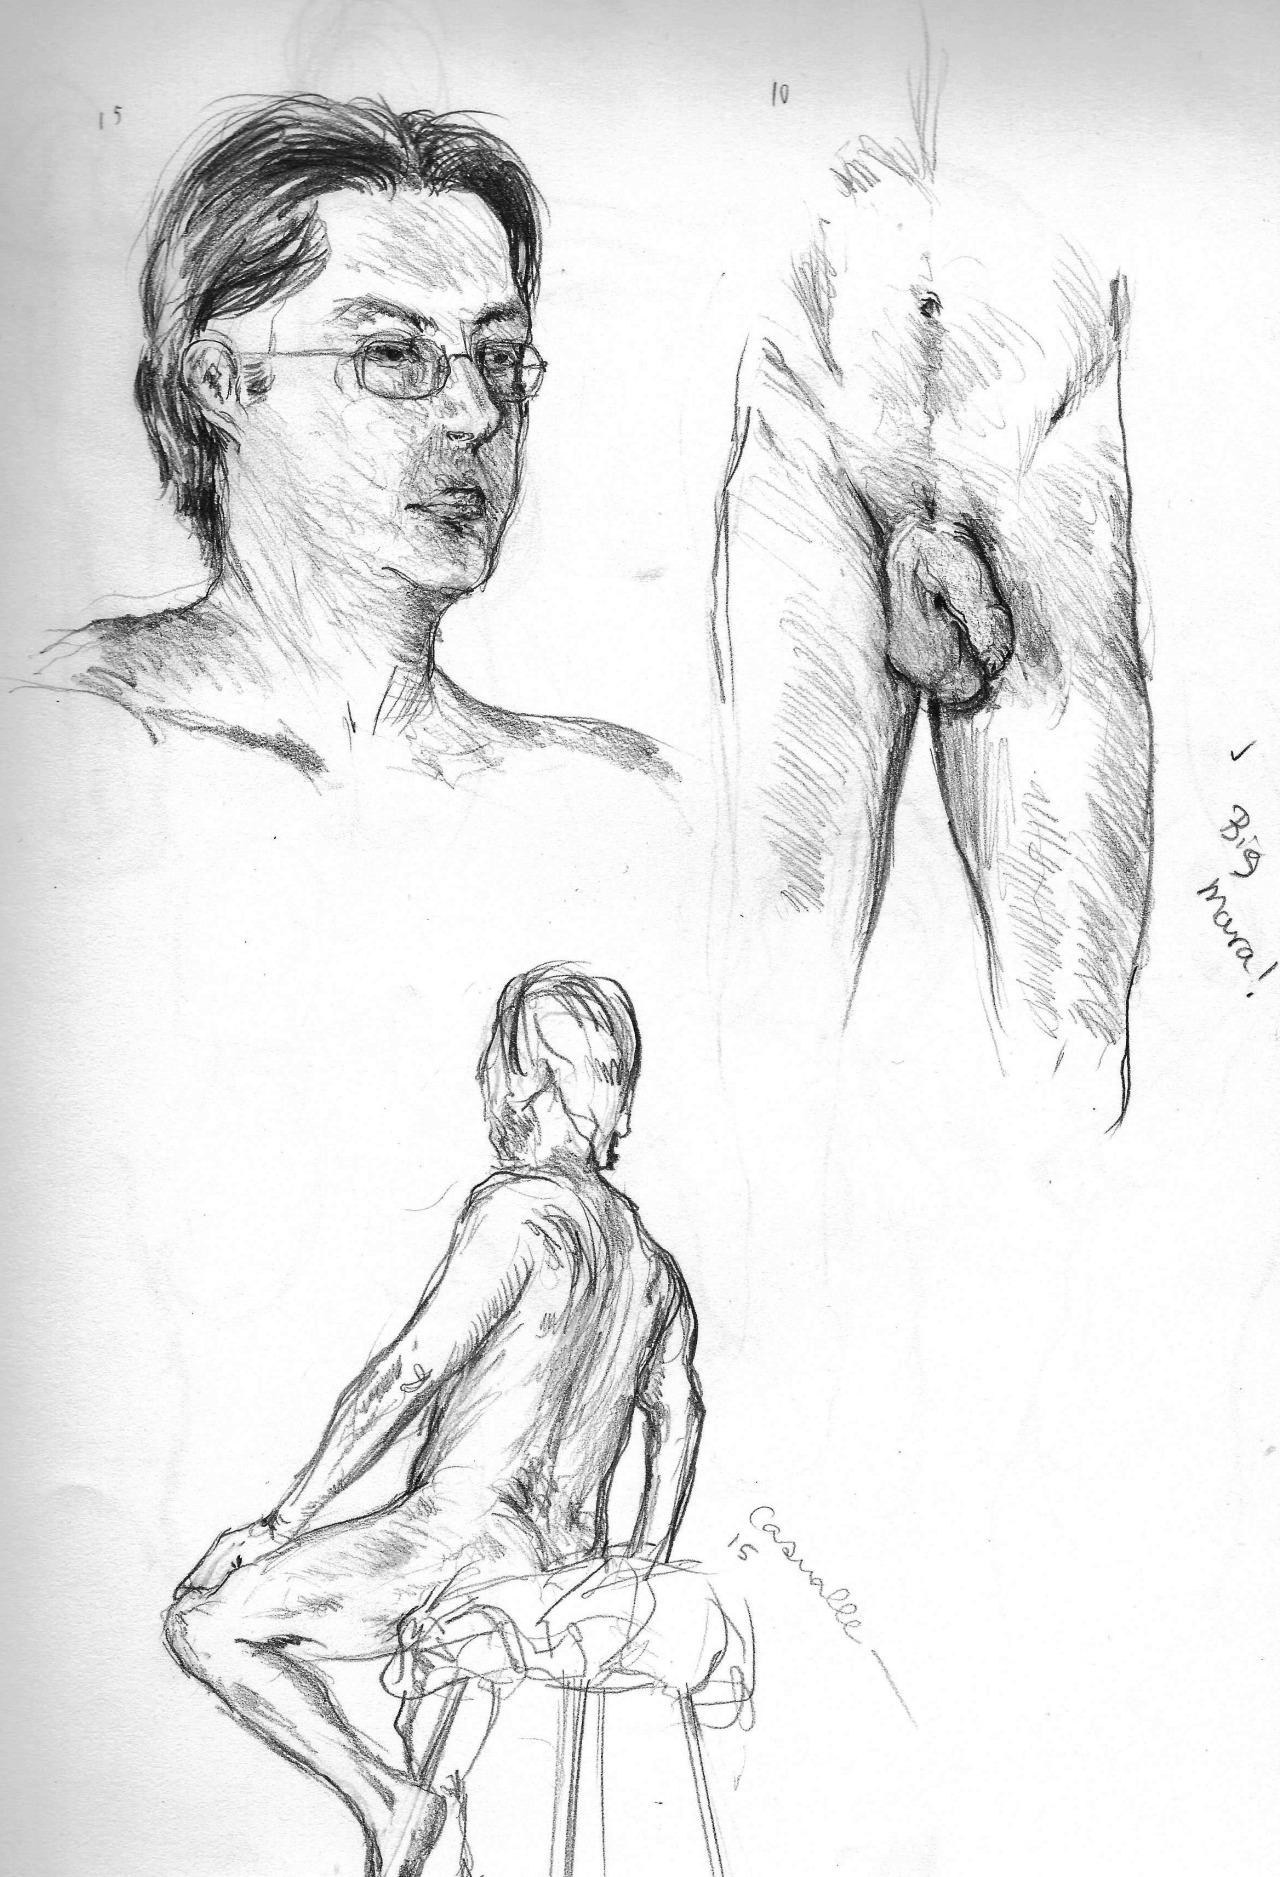 figure drawing study  15, 10 & 15 min  2014